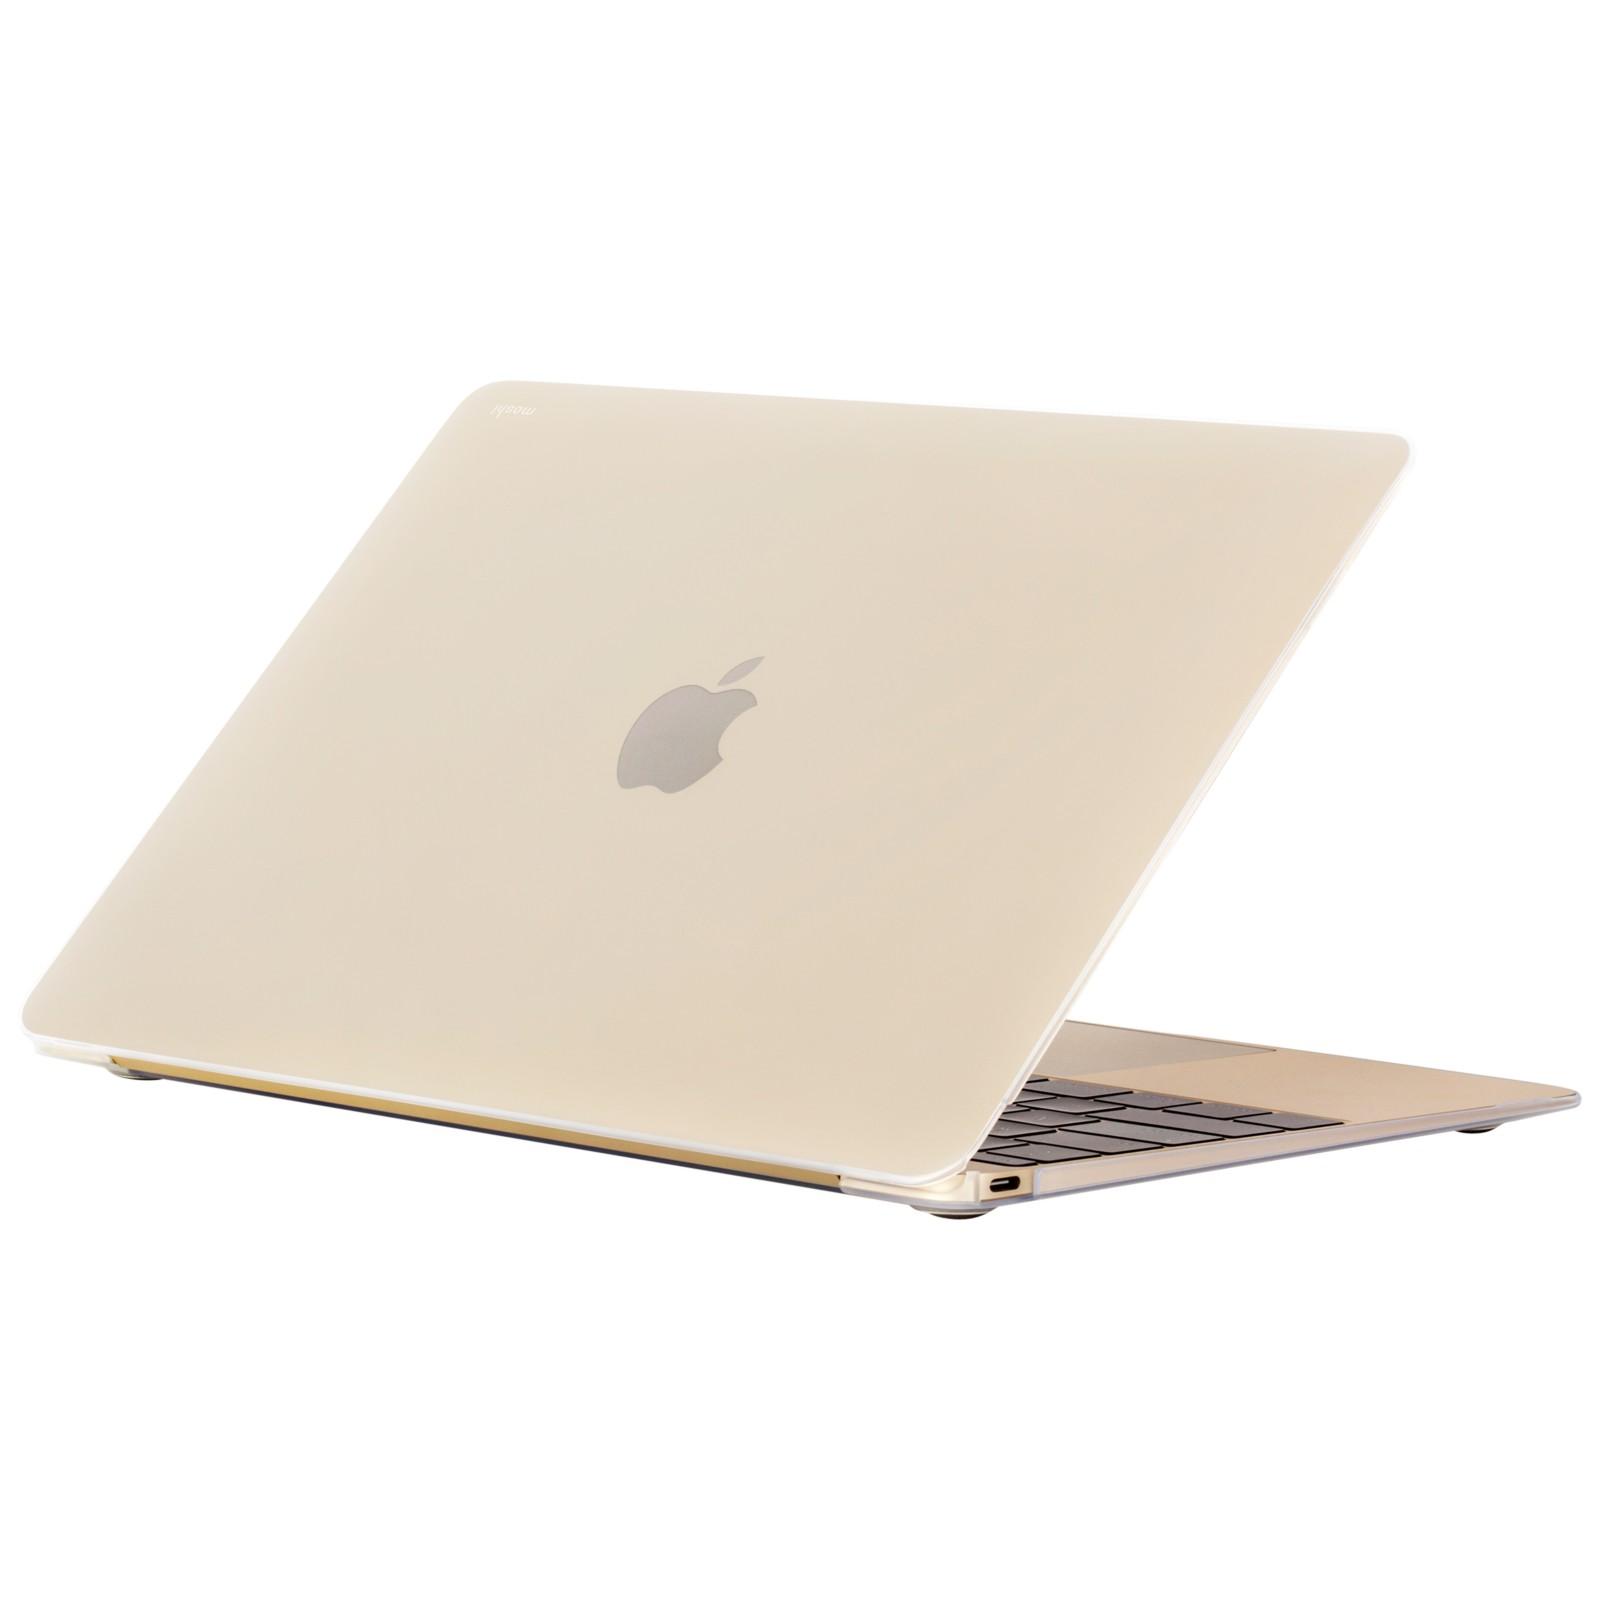 "Moshi iGlaze 12 Protective Shell for 12"" MacBook"